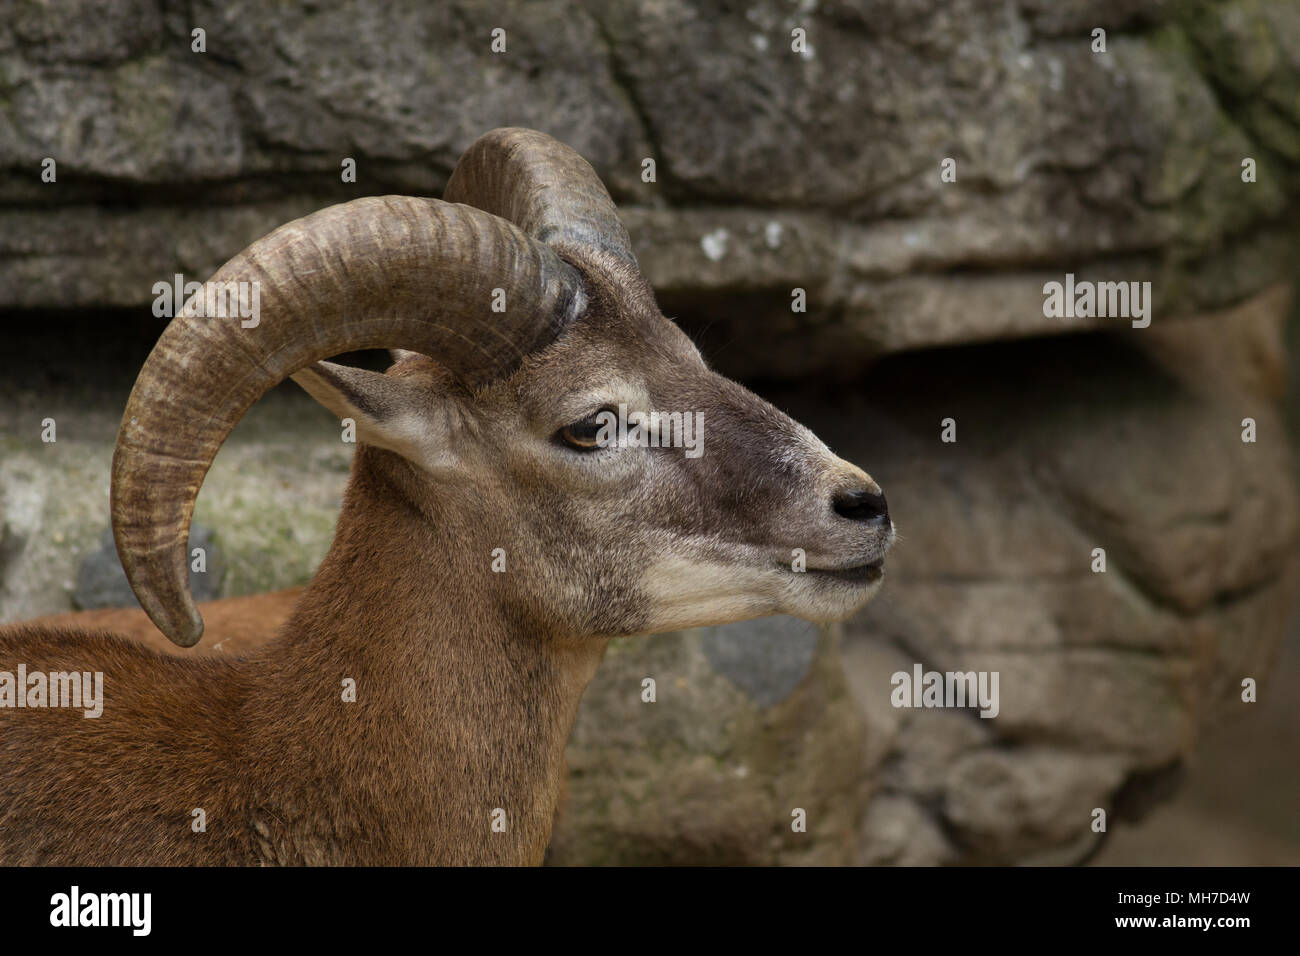 Big Horn Sheep - Stock Image